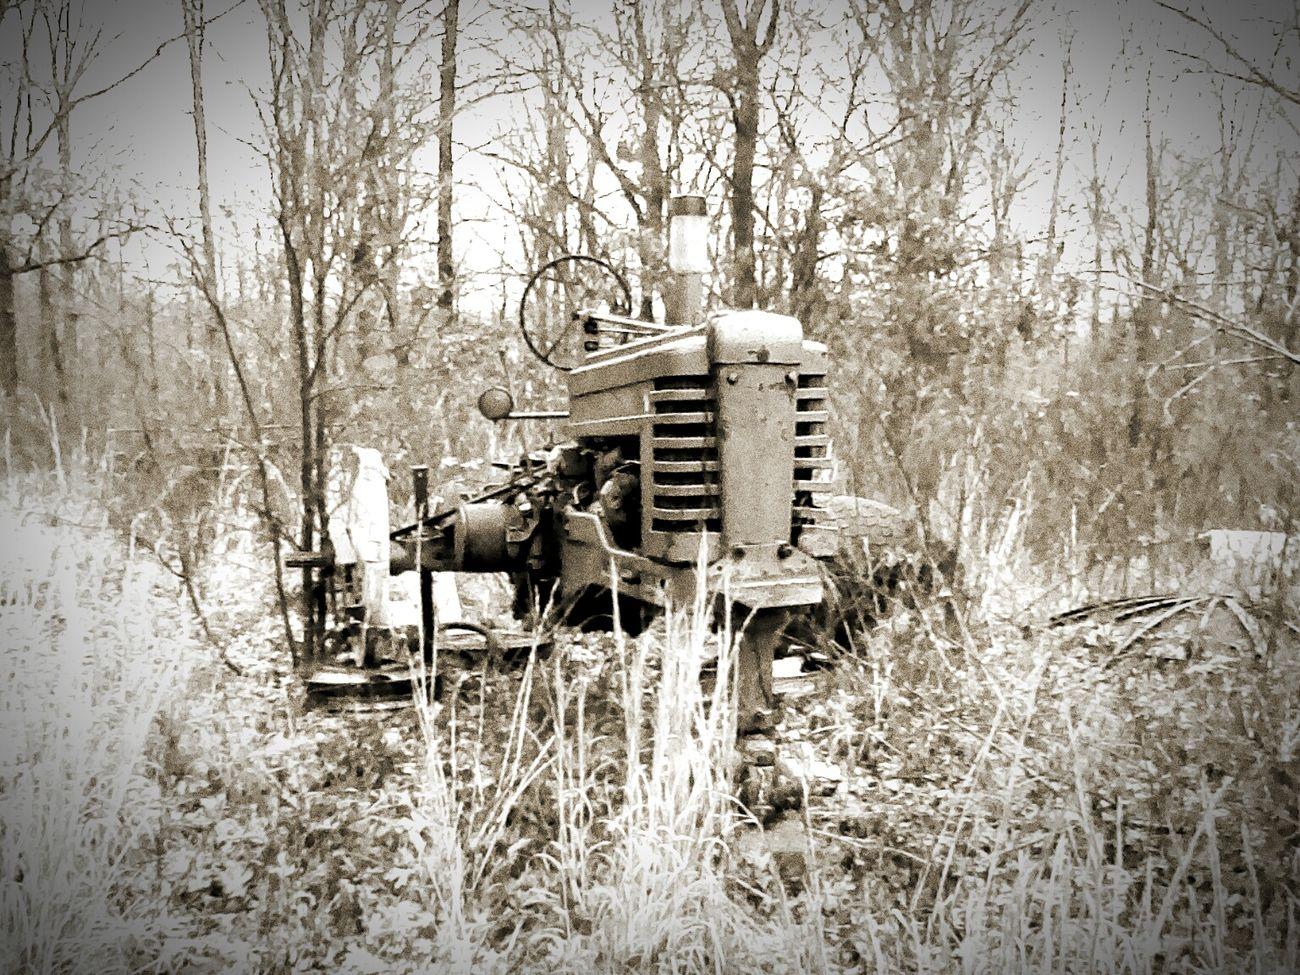 Winter Nature Grunge Vintage Indie B&w Vintagejunkyard Hipster